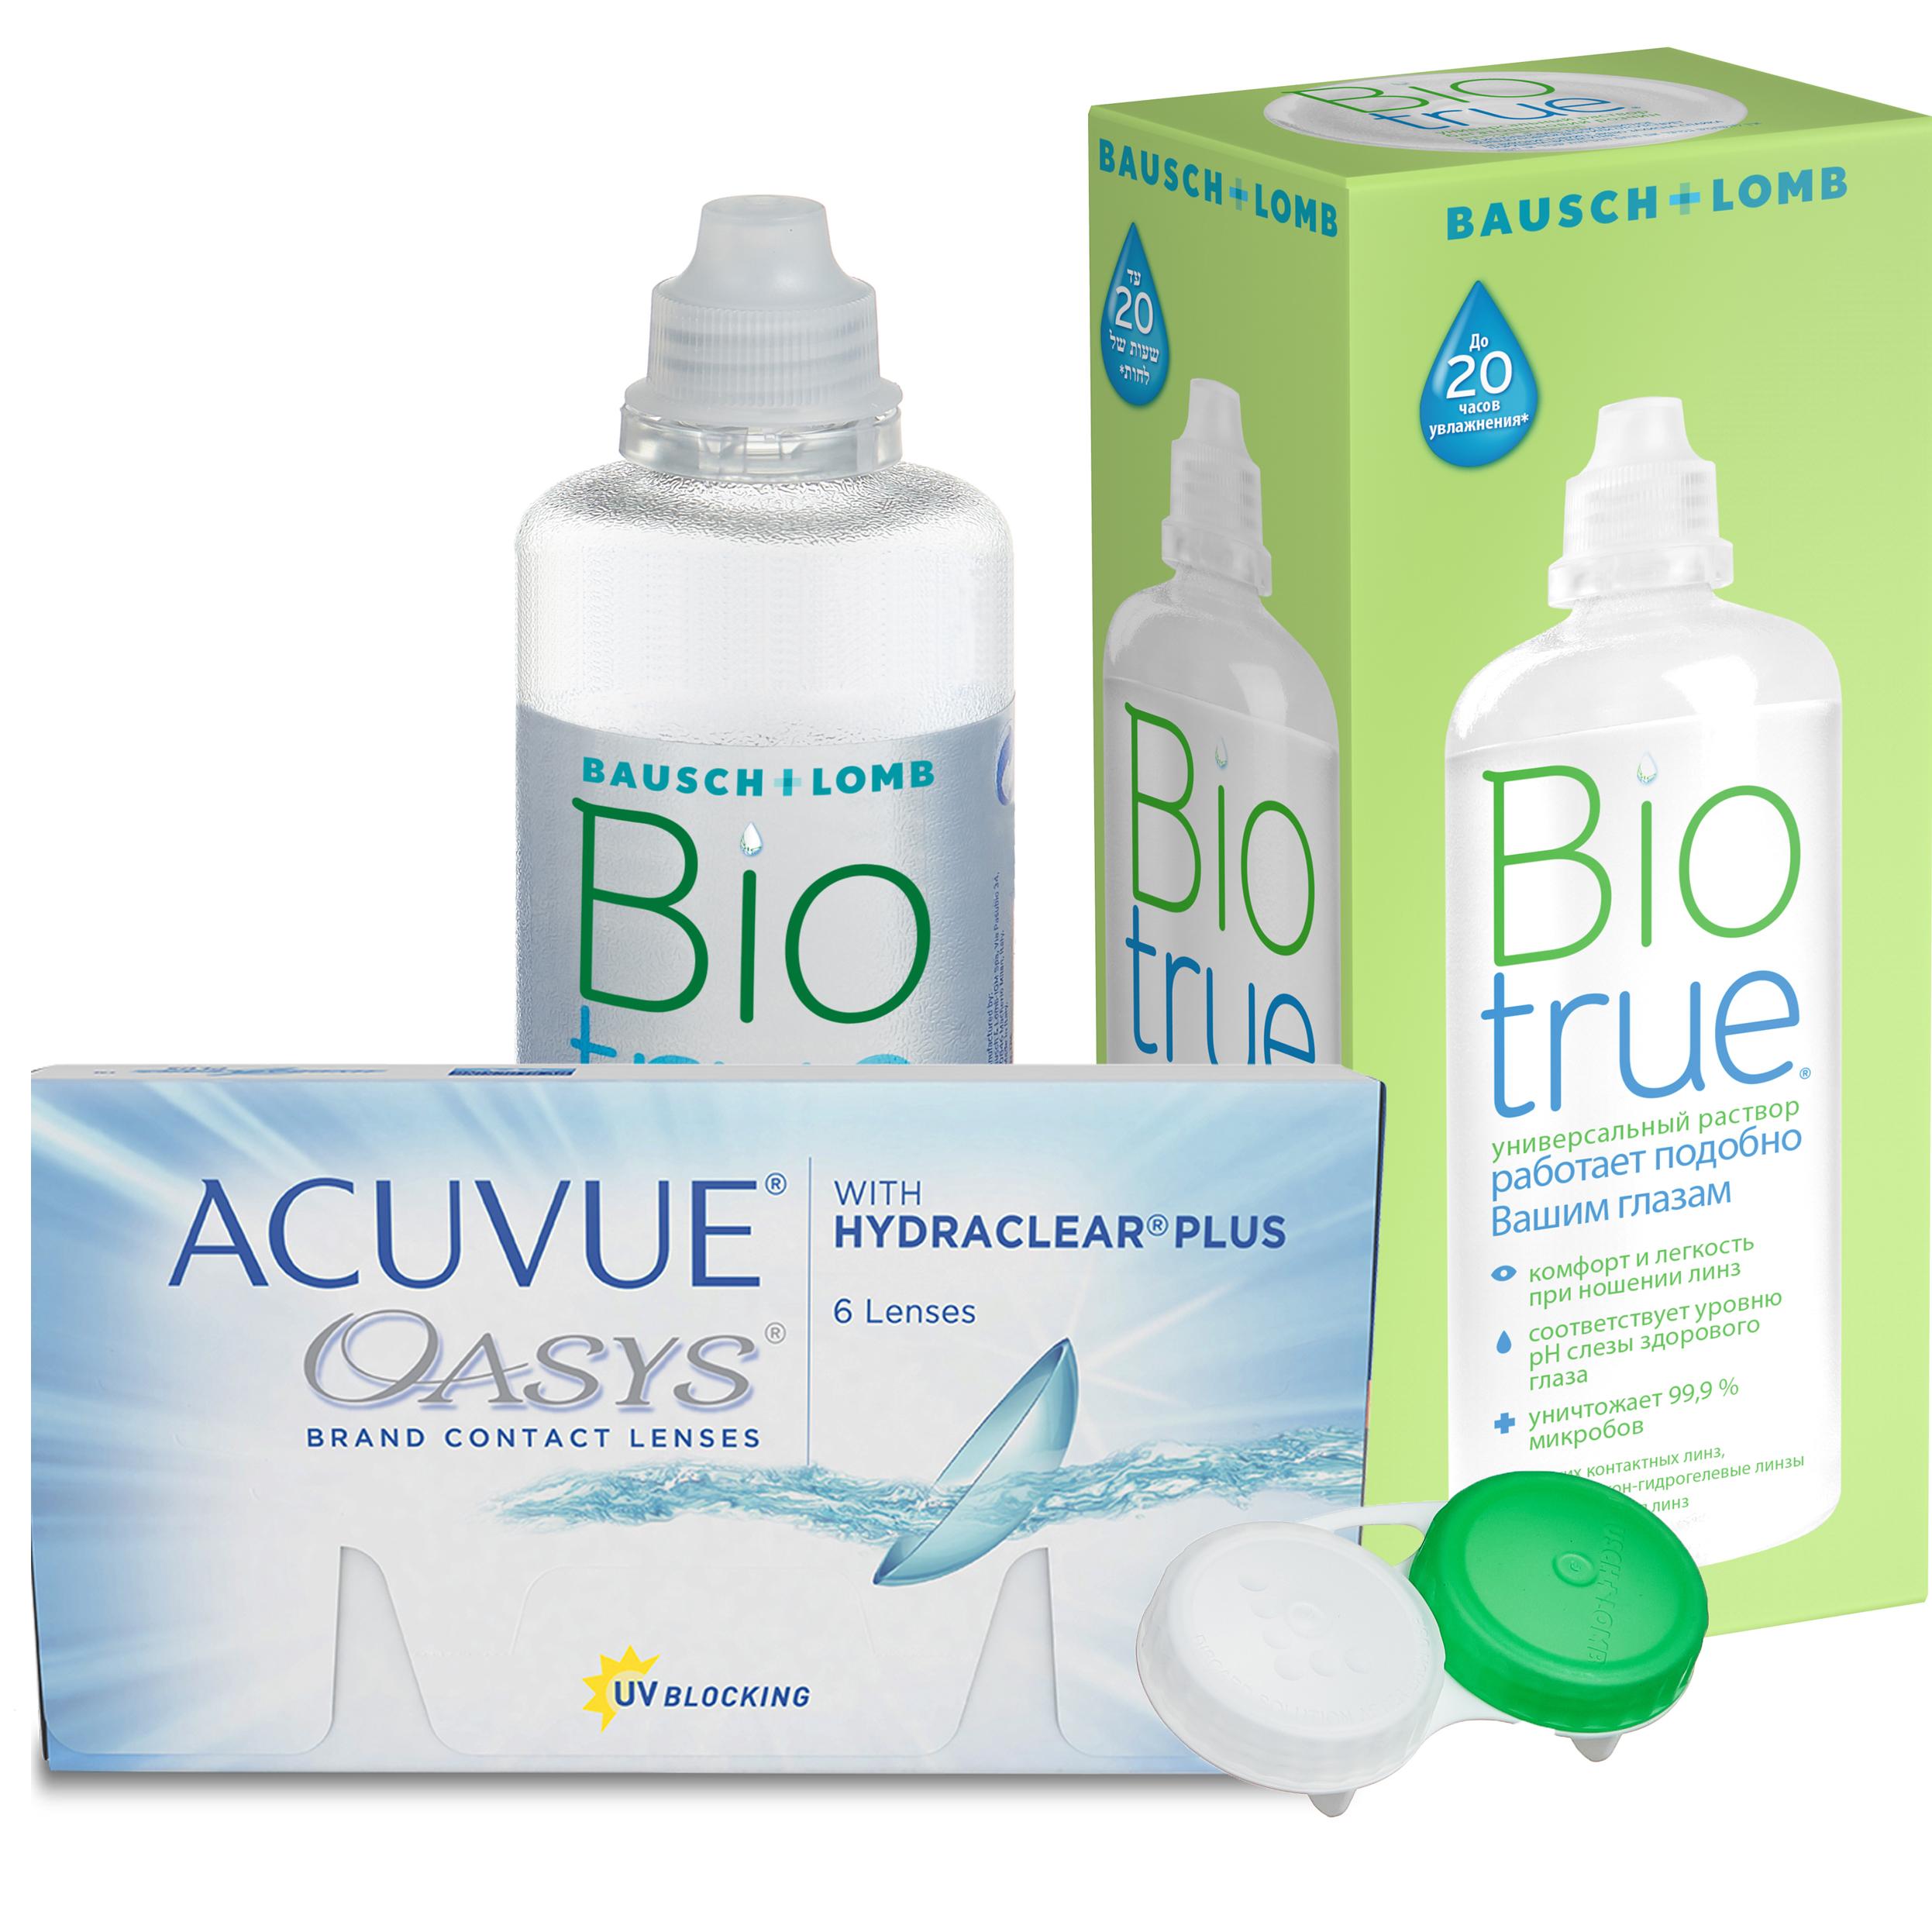 Купить Oasys with Hydraclear Plus 6 линз + Biotrue, Контактные линзы Acuvue Oasys with Hydraclear Plus 6 линз R 8.8 +4, 00 + Biotrue 300 мл